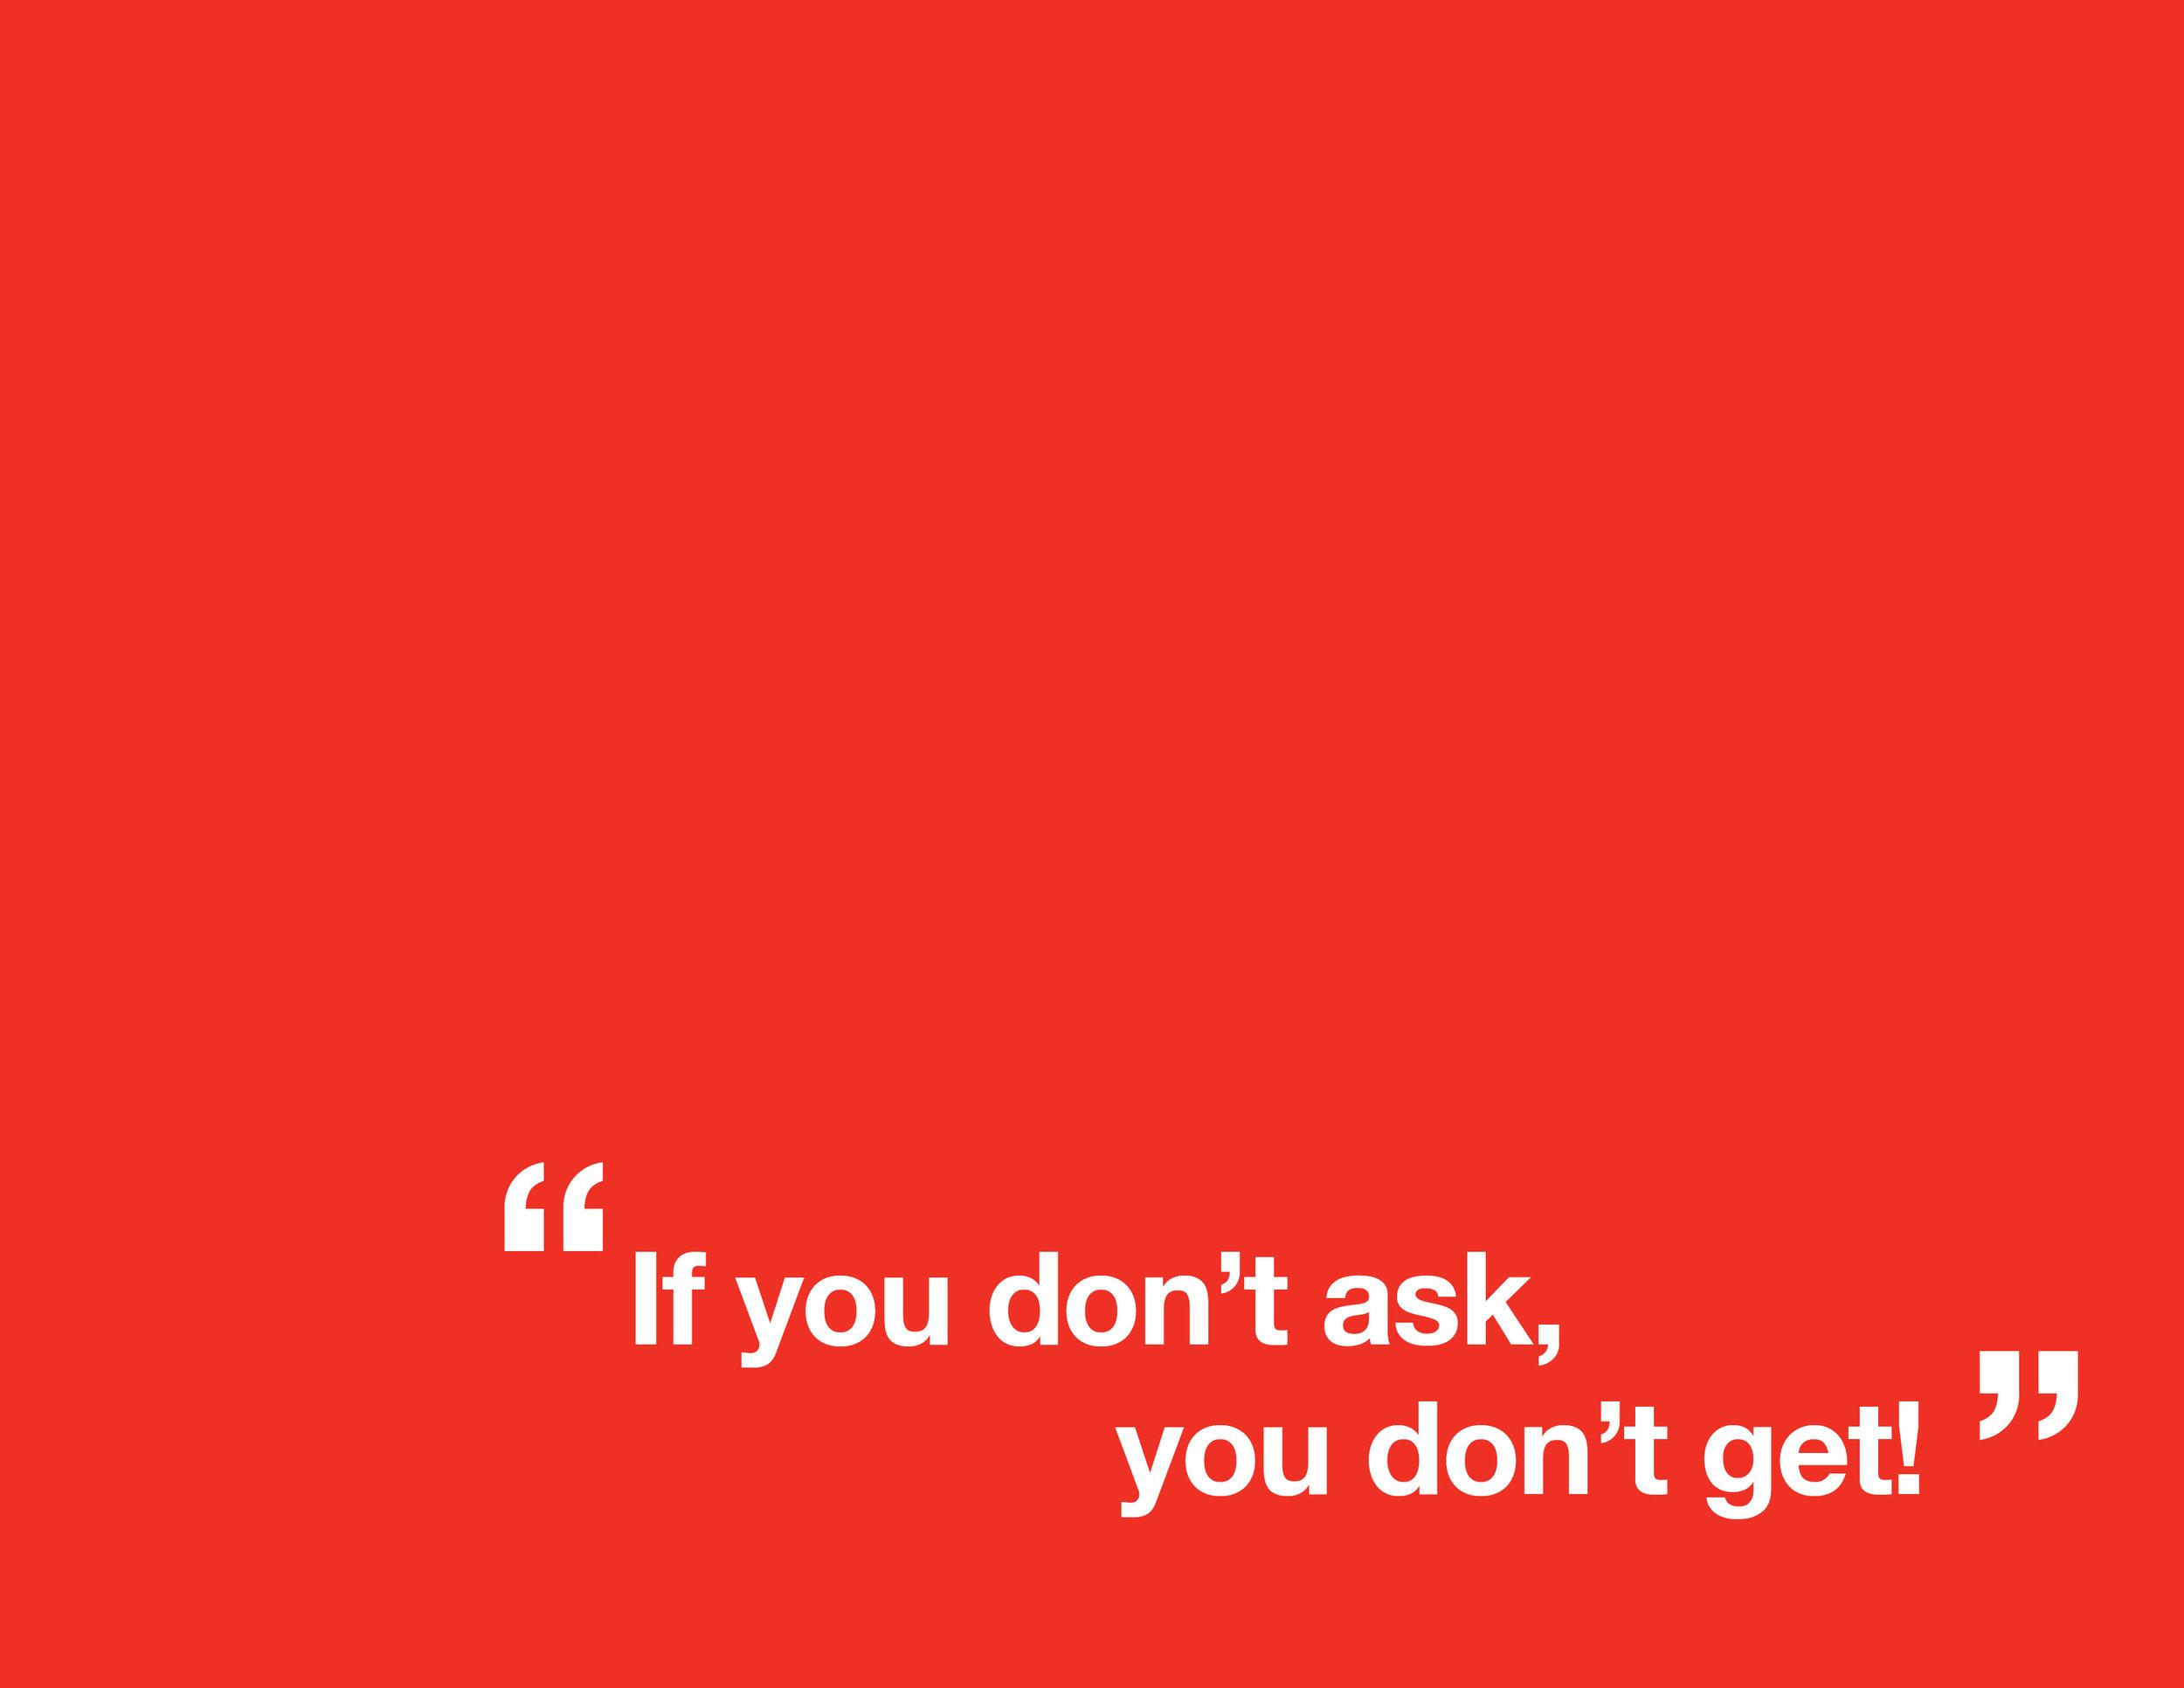 quotes3.jpg